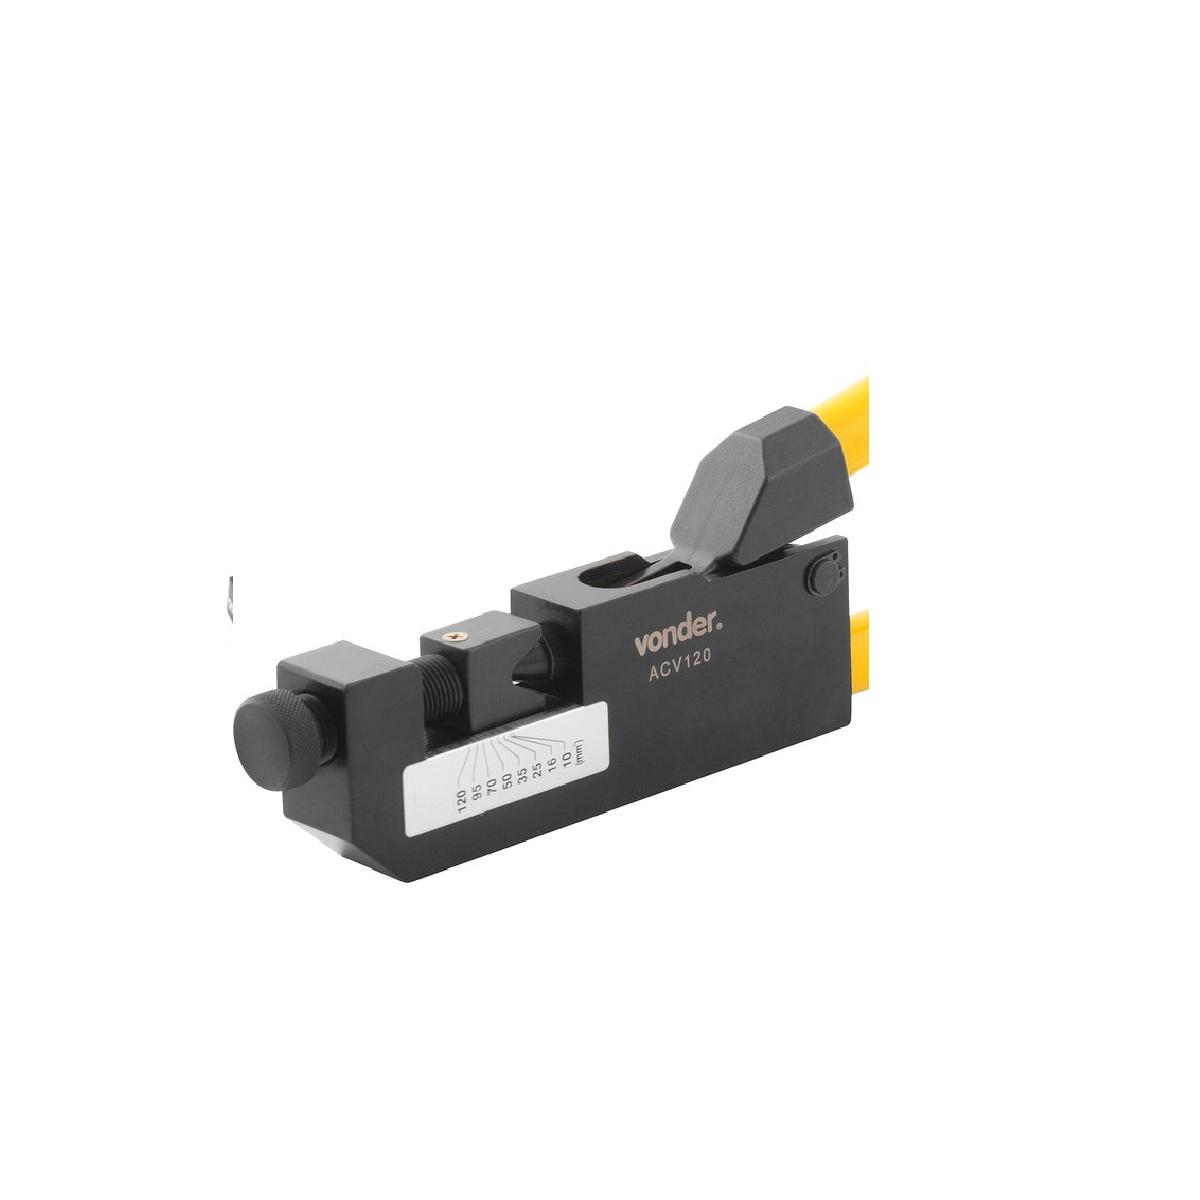 Alicate crimpador ACV 120 VONDER